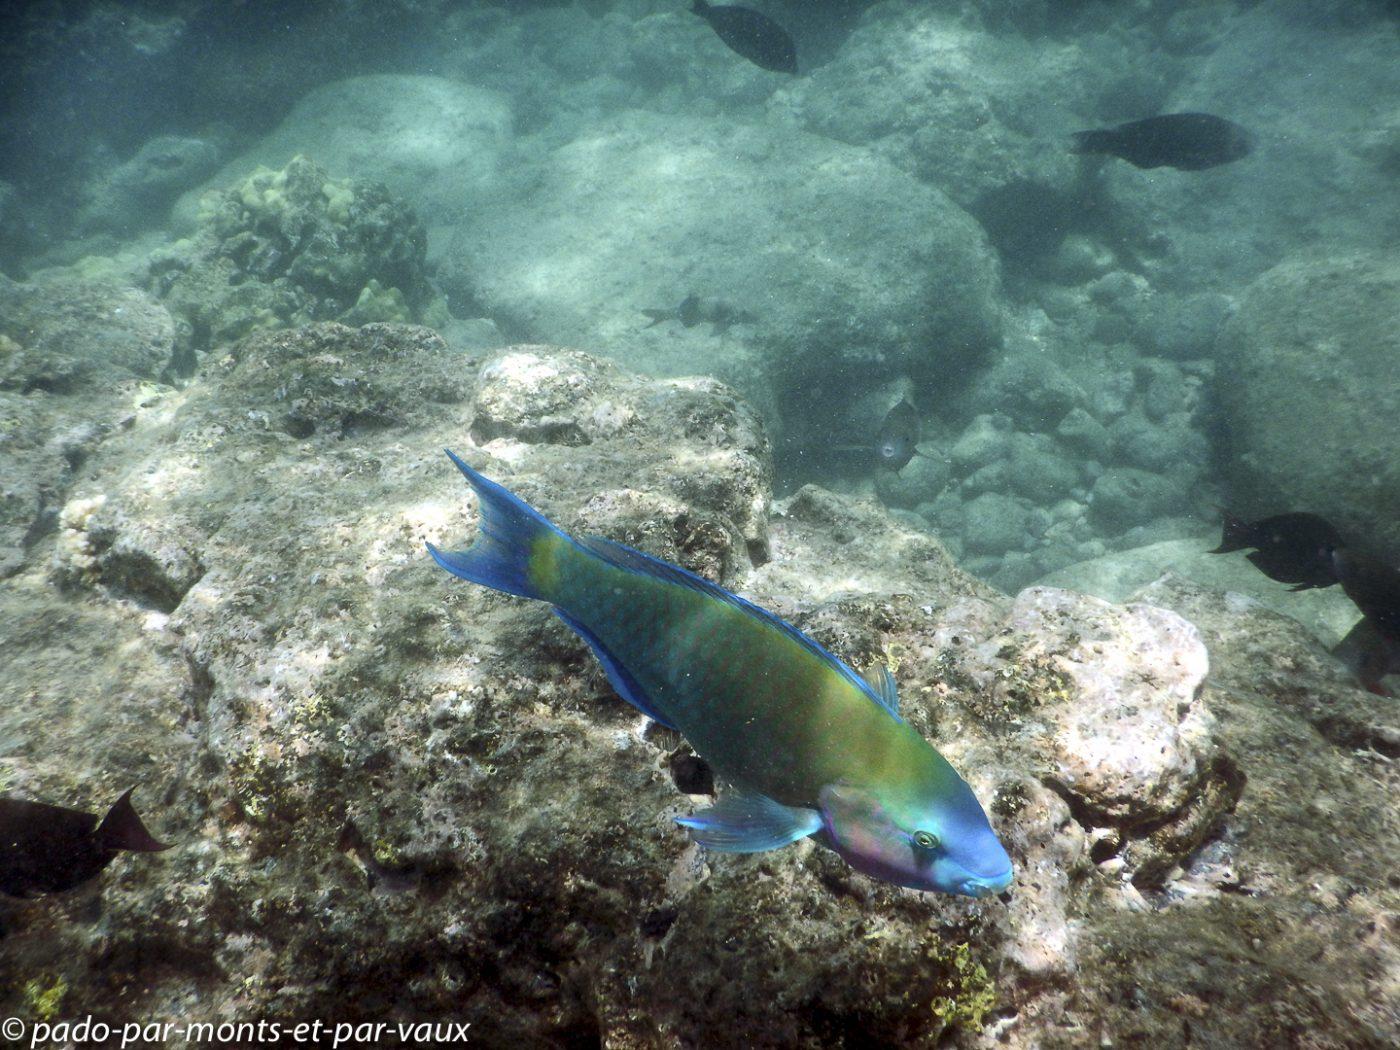 Maui -  Ahihi kina'u reserve - poisson perroquet